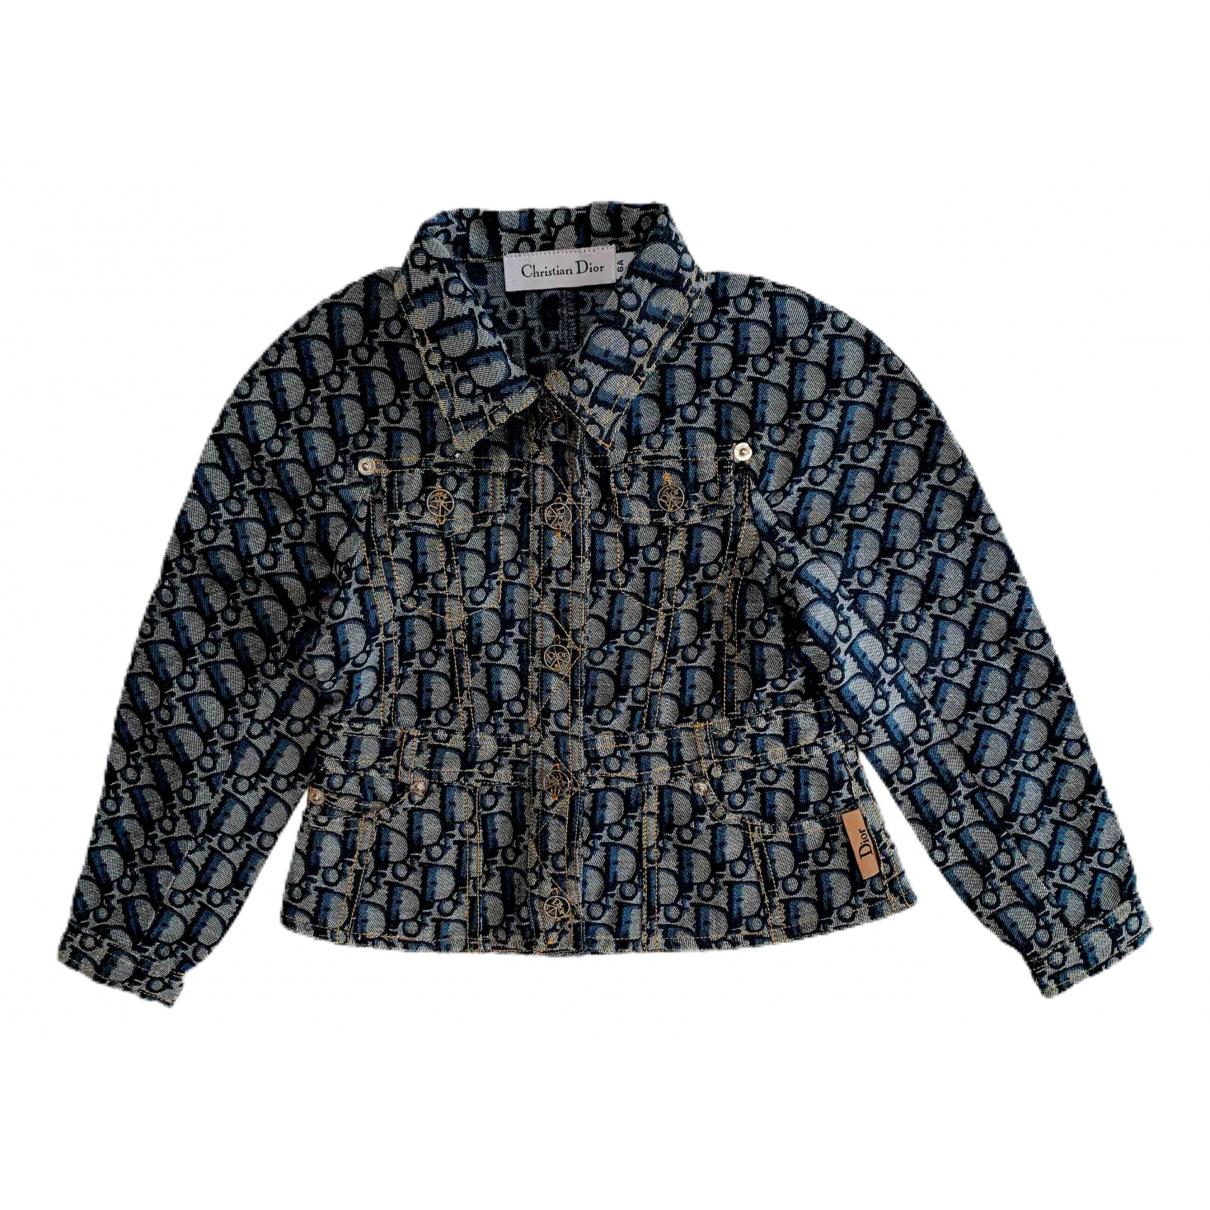 Dior \N Blue Denim - Jeans jacket & coat for Kids 6 years - until 45 inches UK